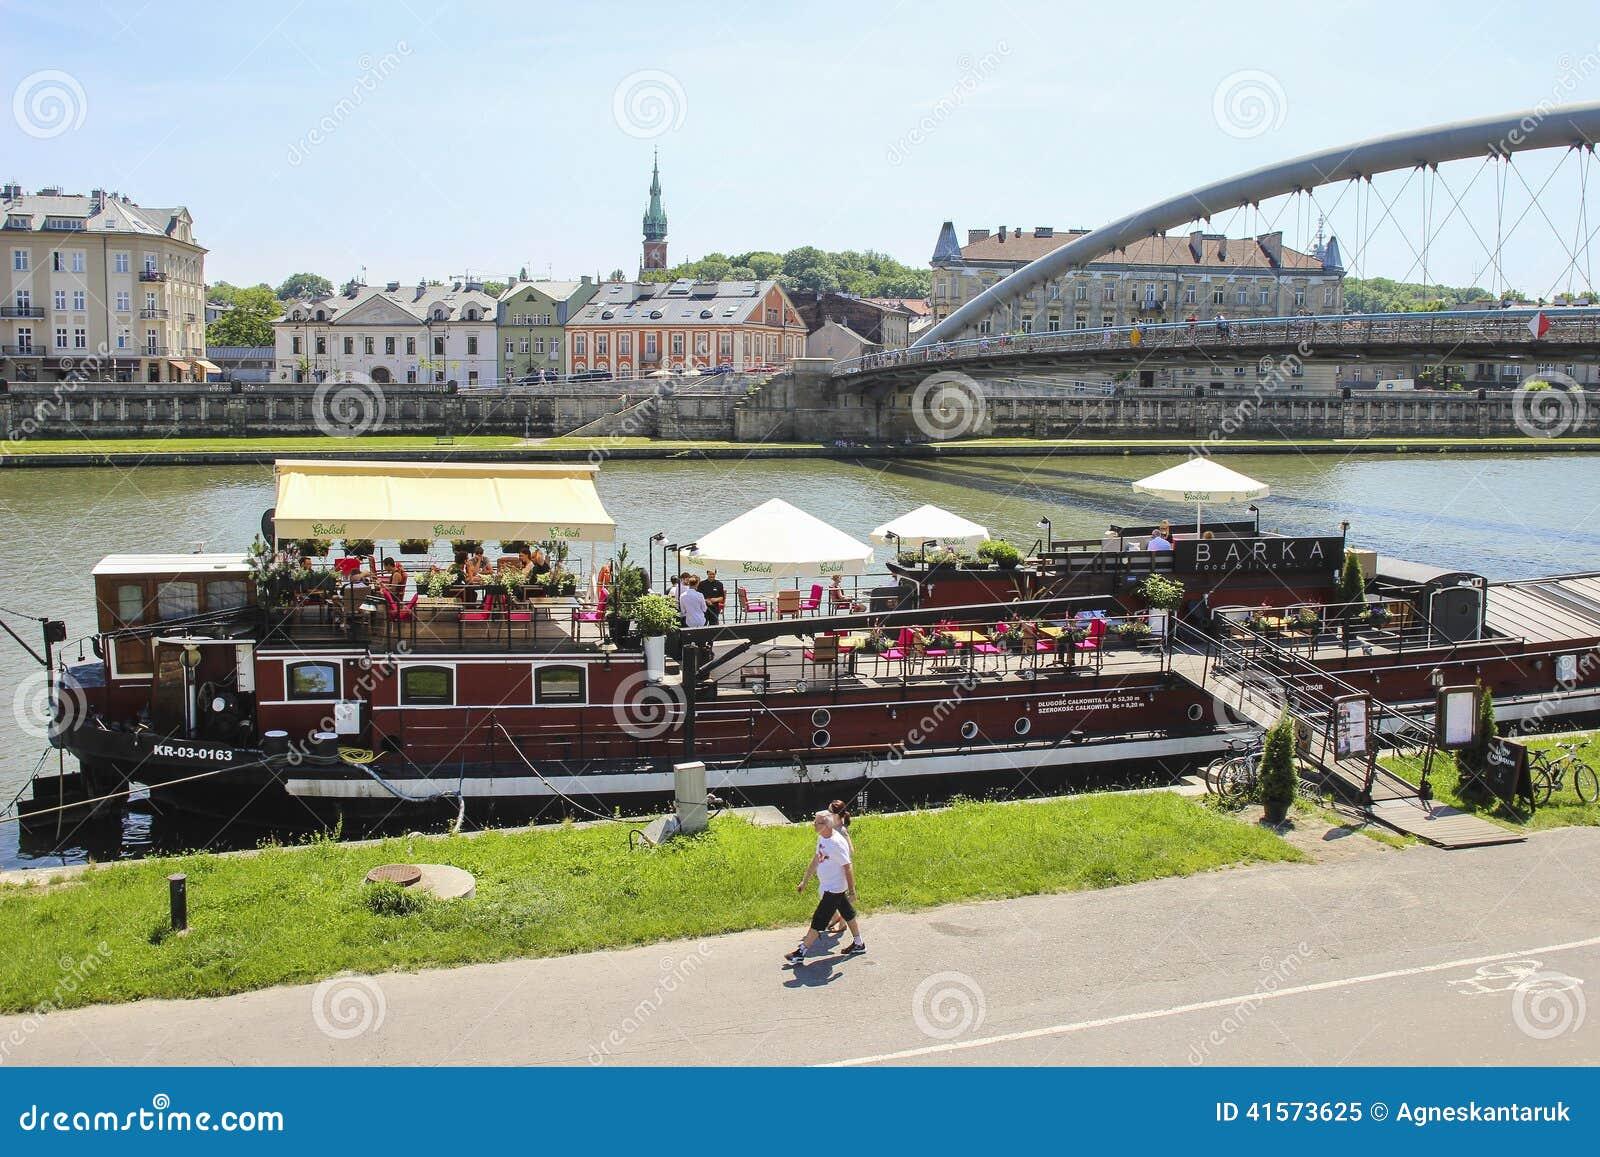 Wisla Krakow: Barges On Wisla River, Krakow Poland Editorial Image